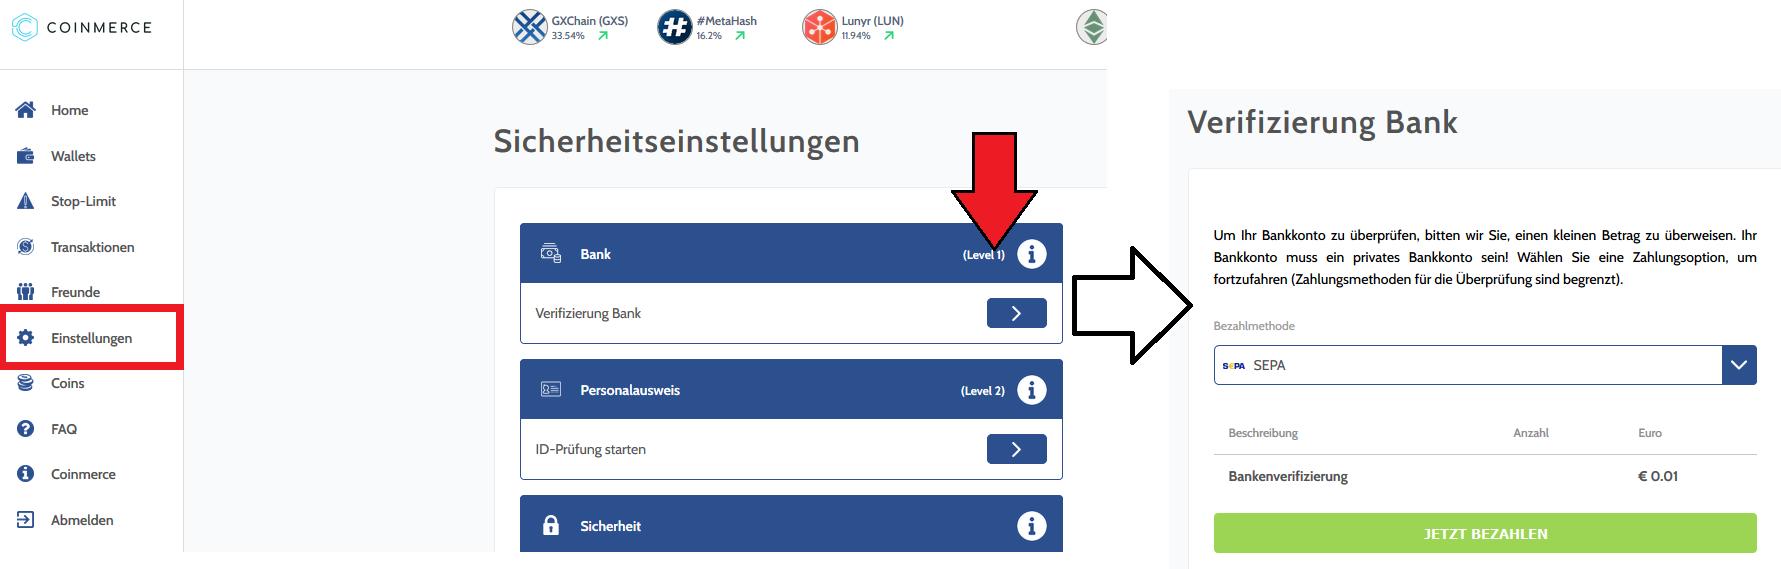 EOS kaufen Coinmerce Anleitung